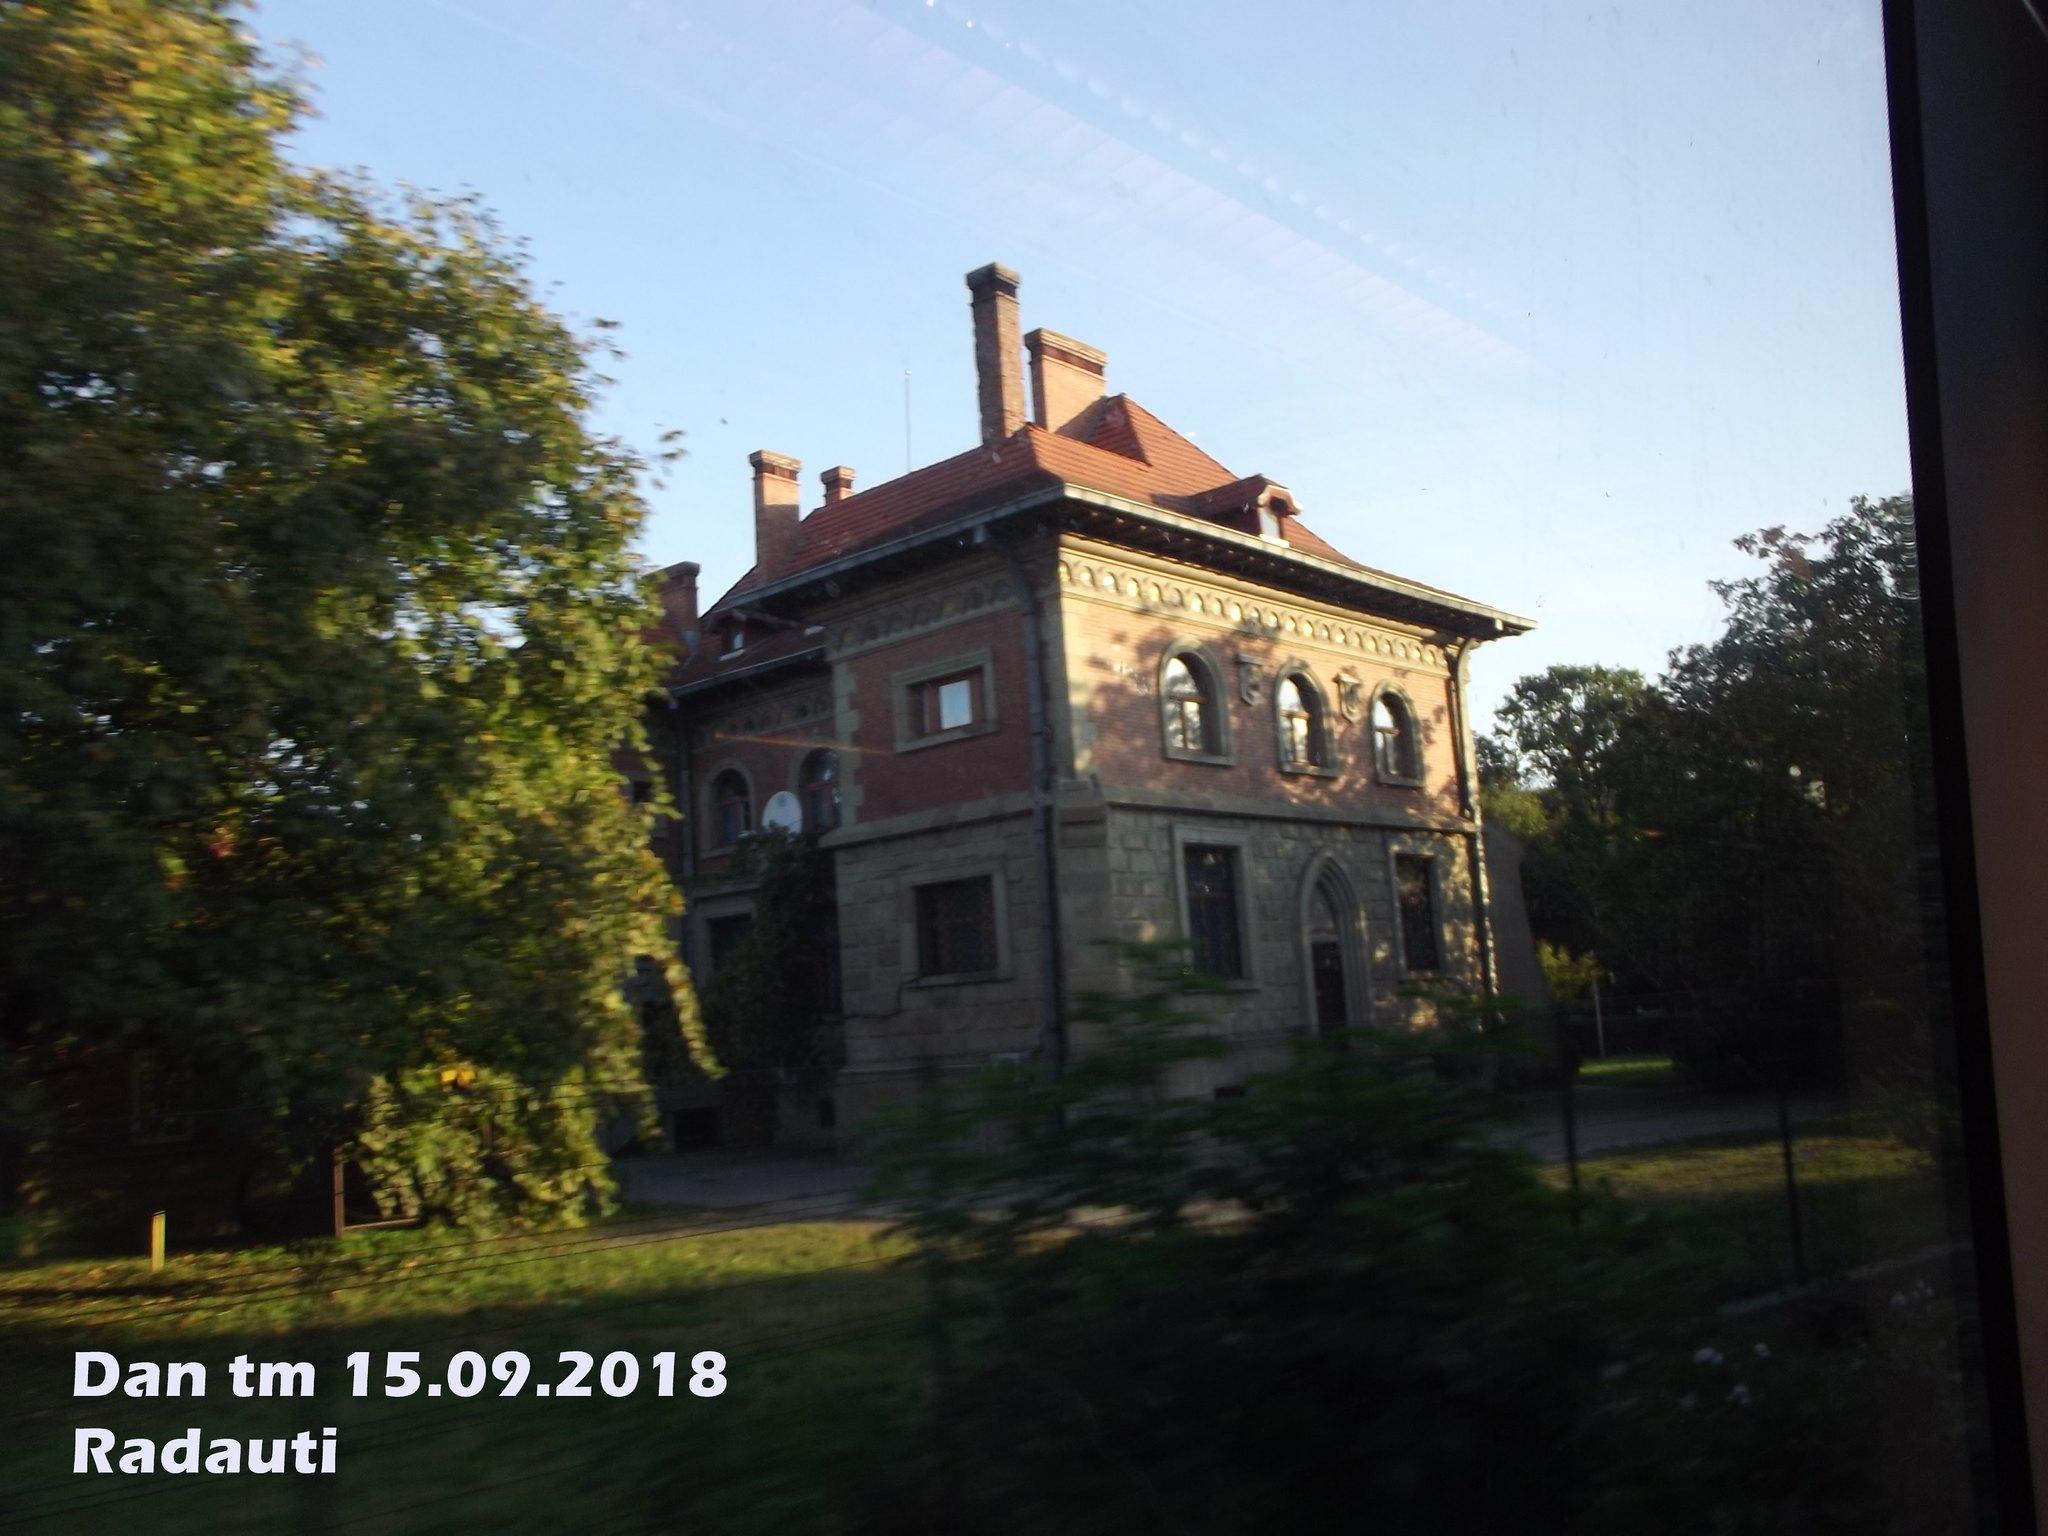 515 : Dorneşti - Gura Putnei - (Putna) - Nisipitu - Seletin UKR - Pagina 47 43826160045_dcdf2a9ceb_k